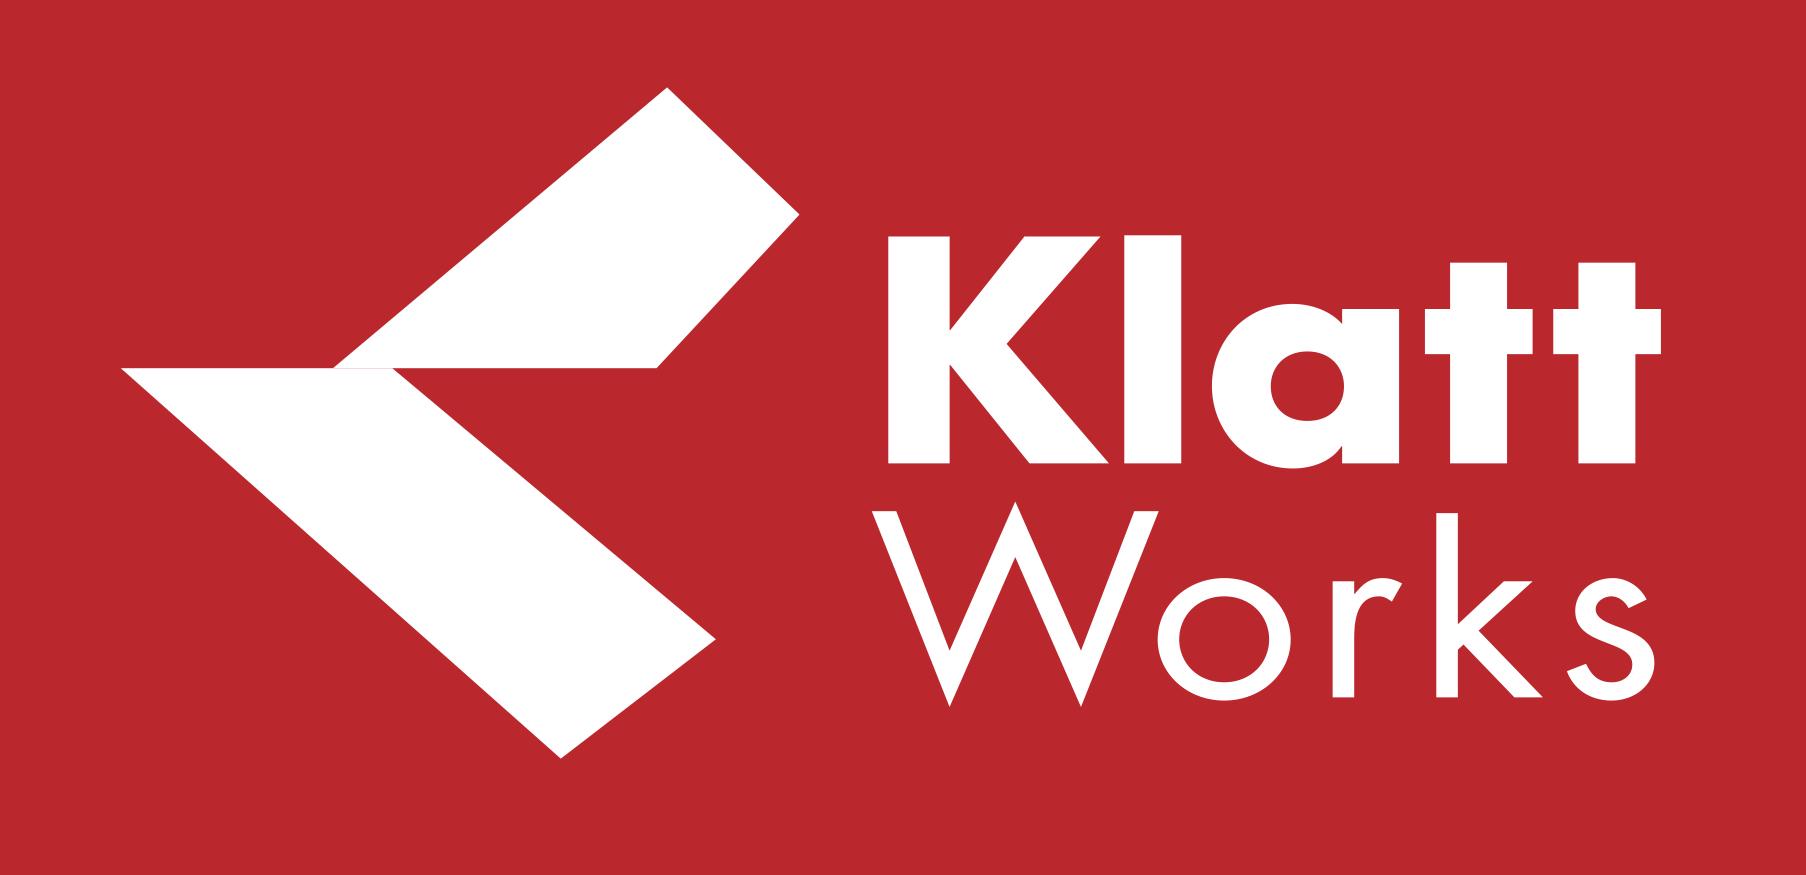 Klatt Works